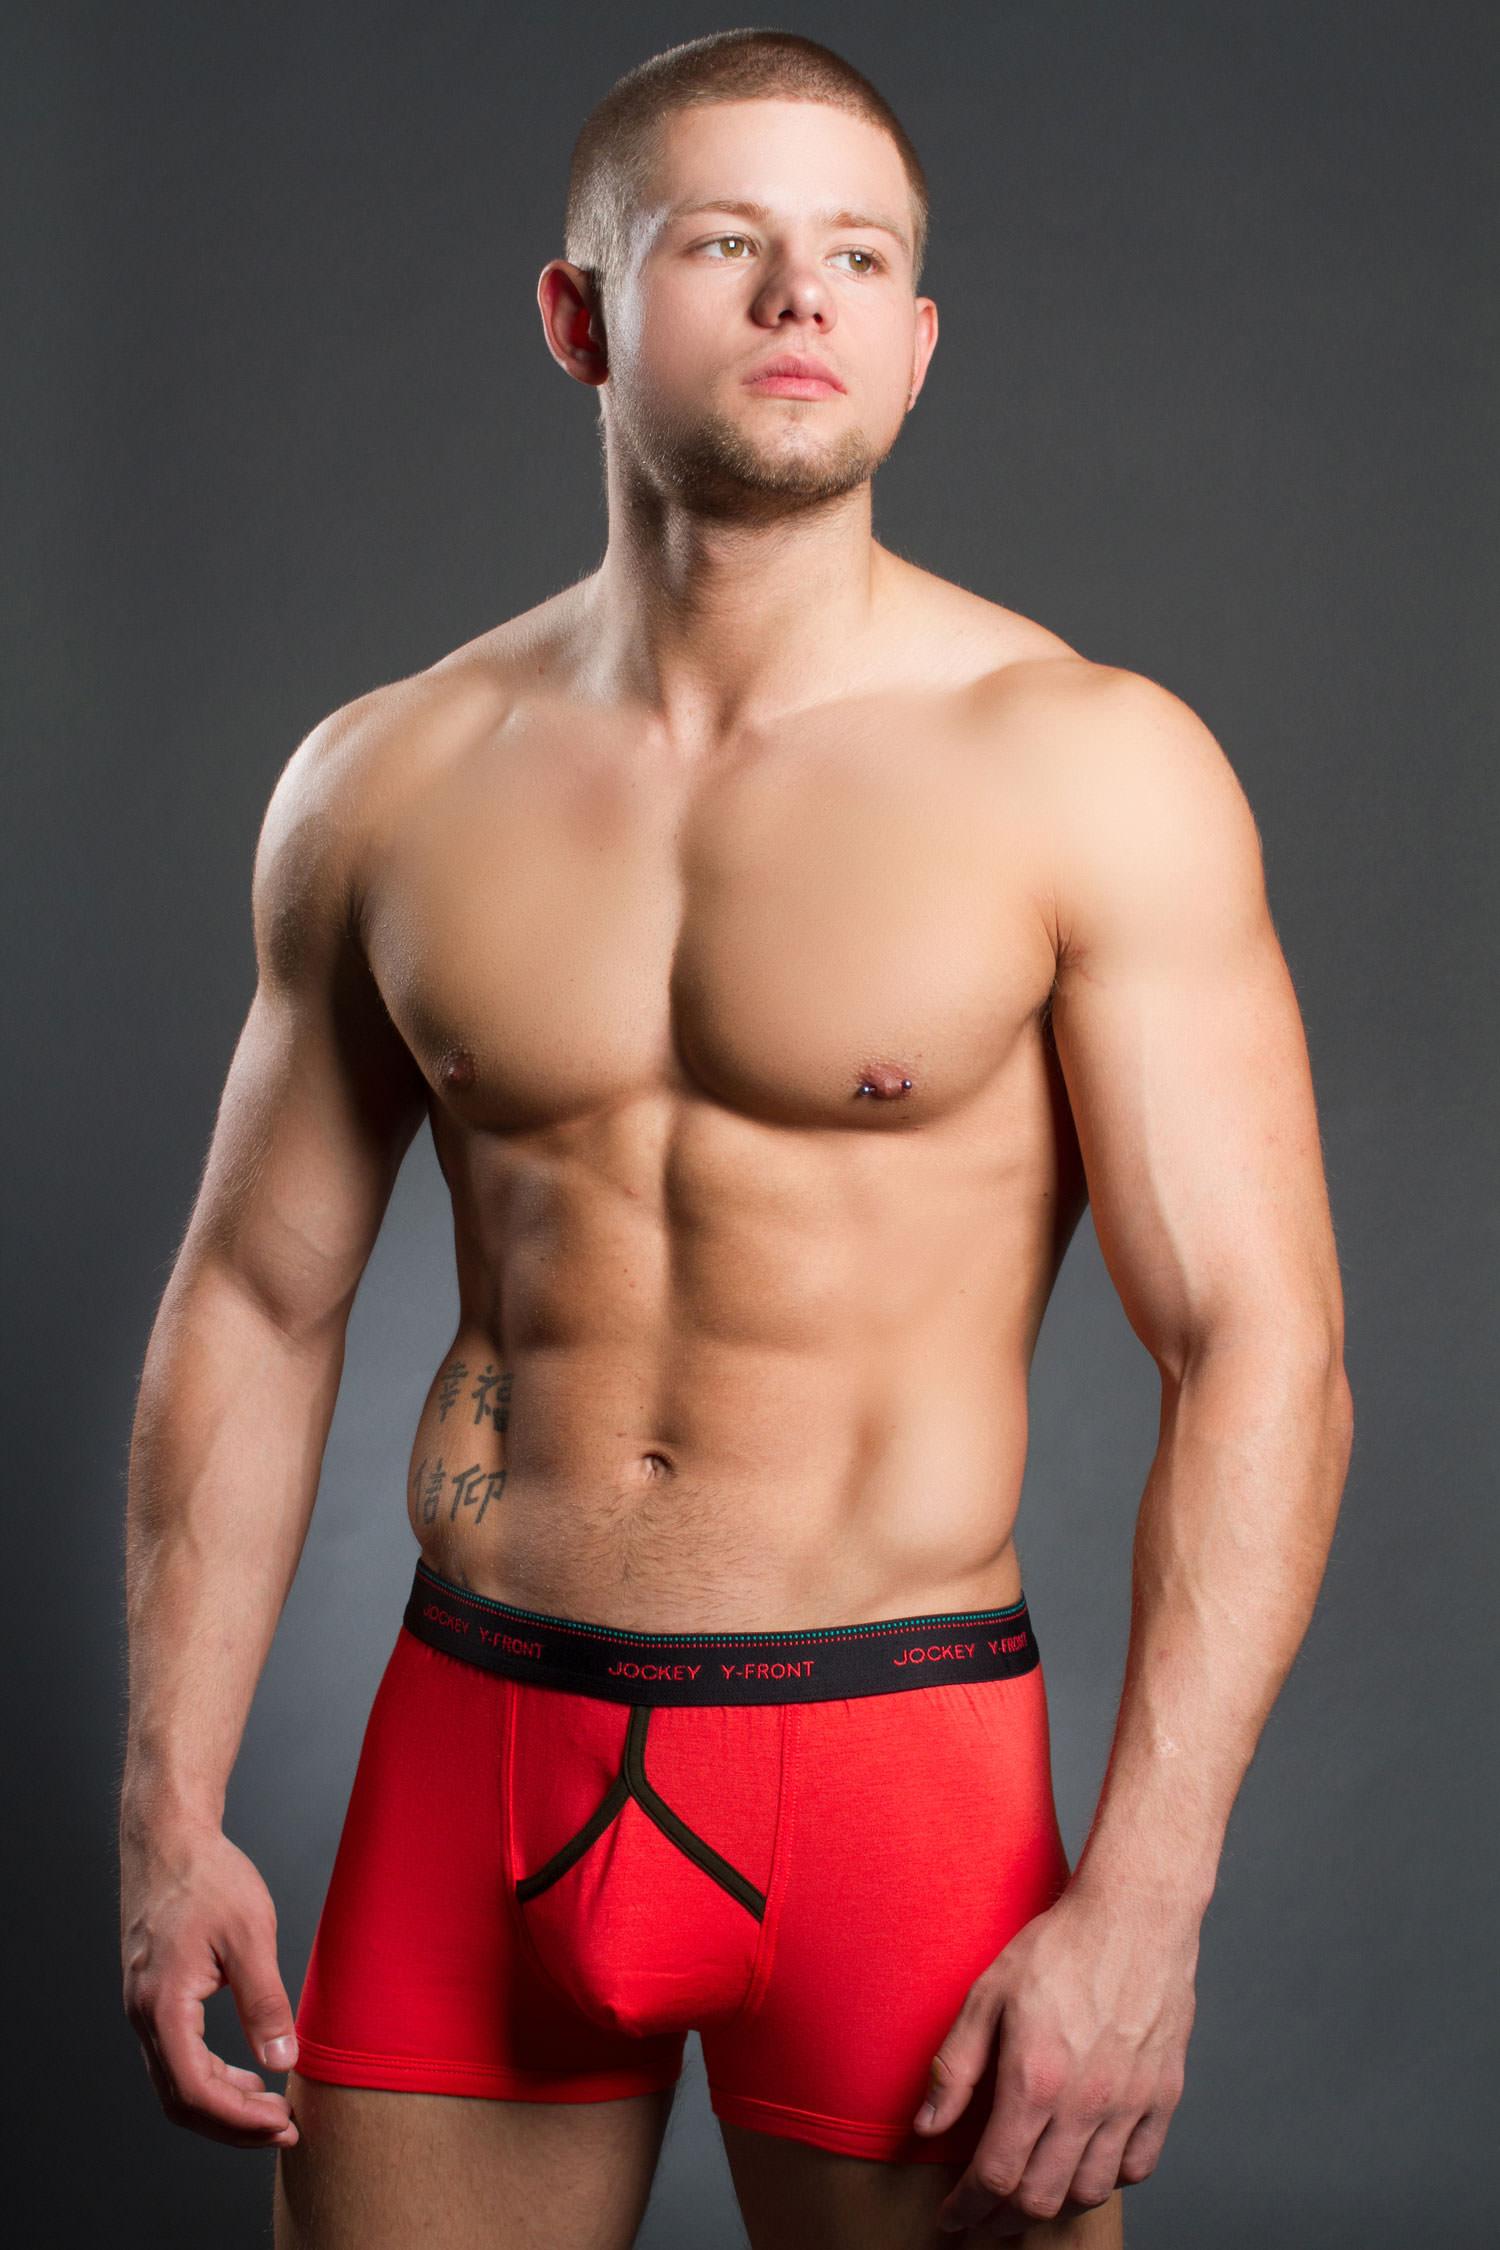 Iago Botelho for Teamm8 | Male Celeb News